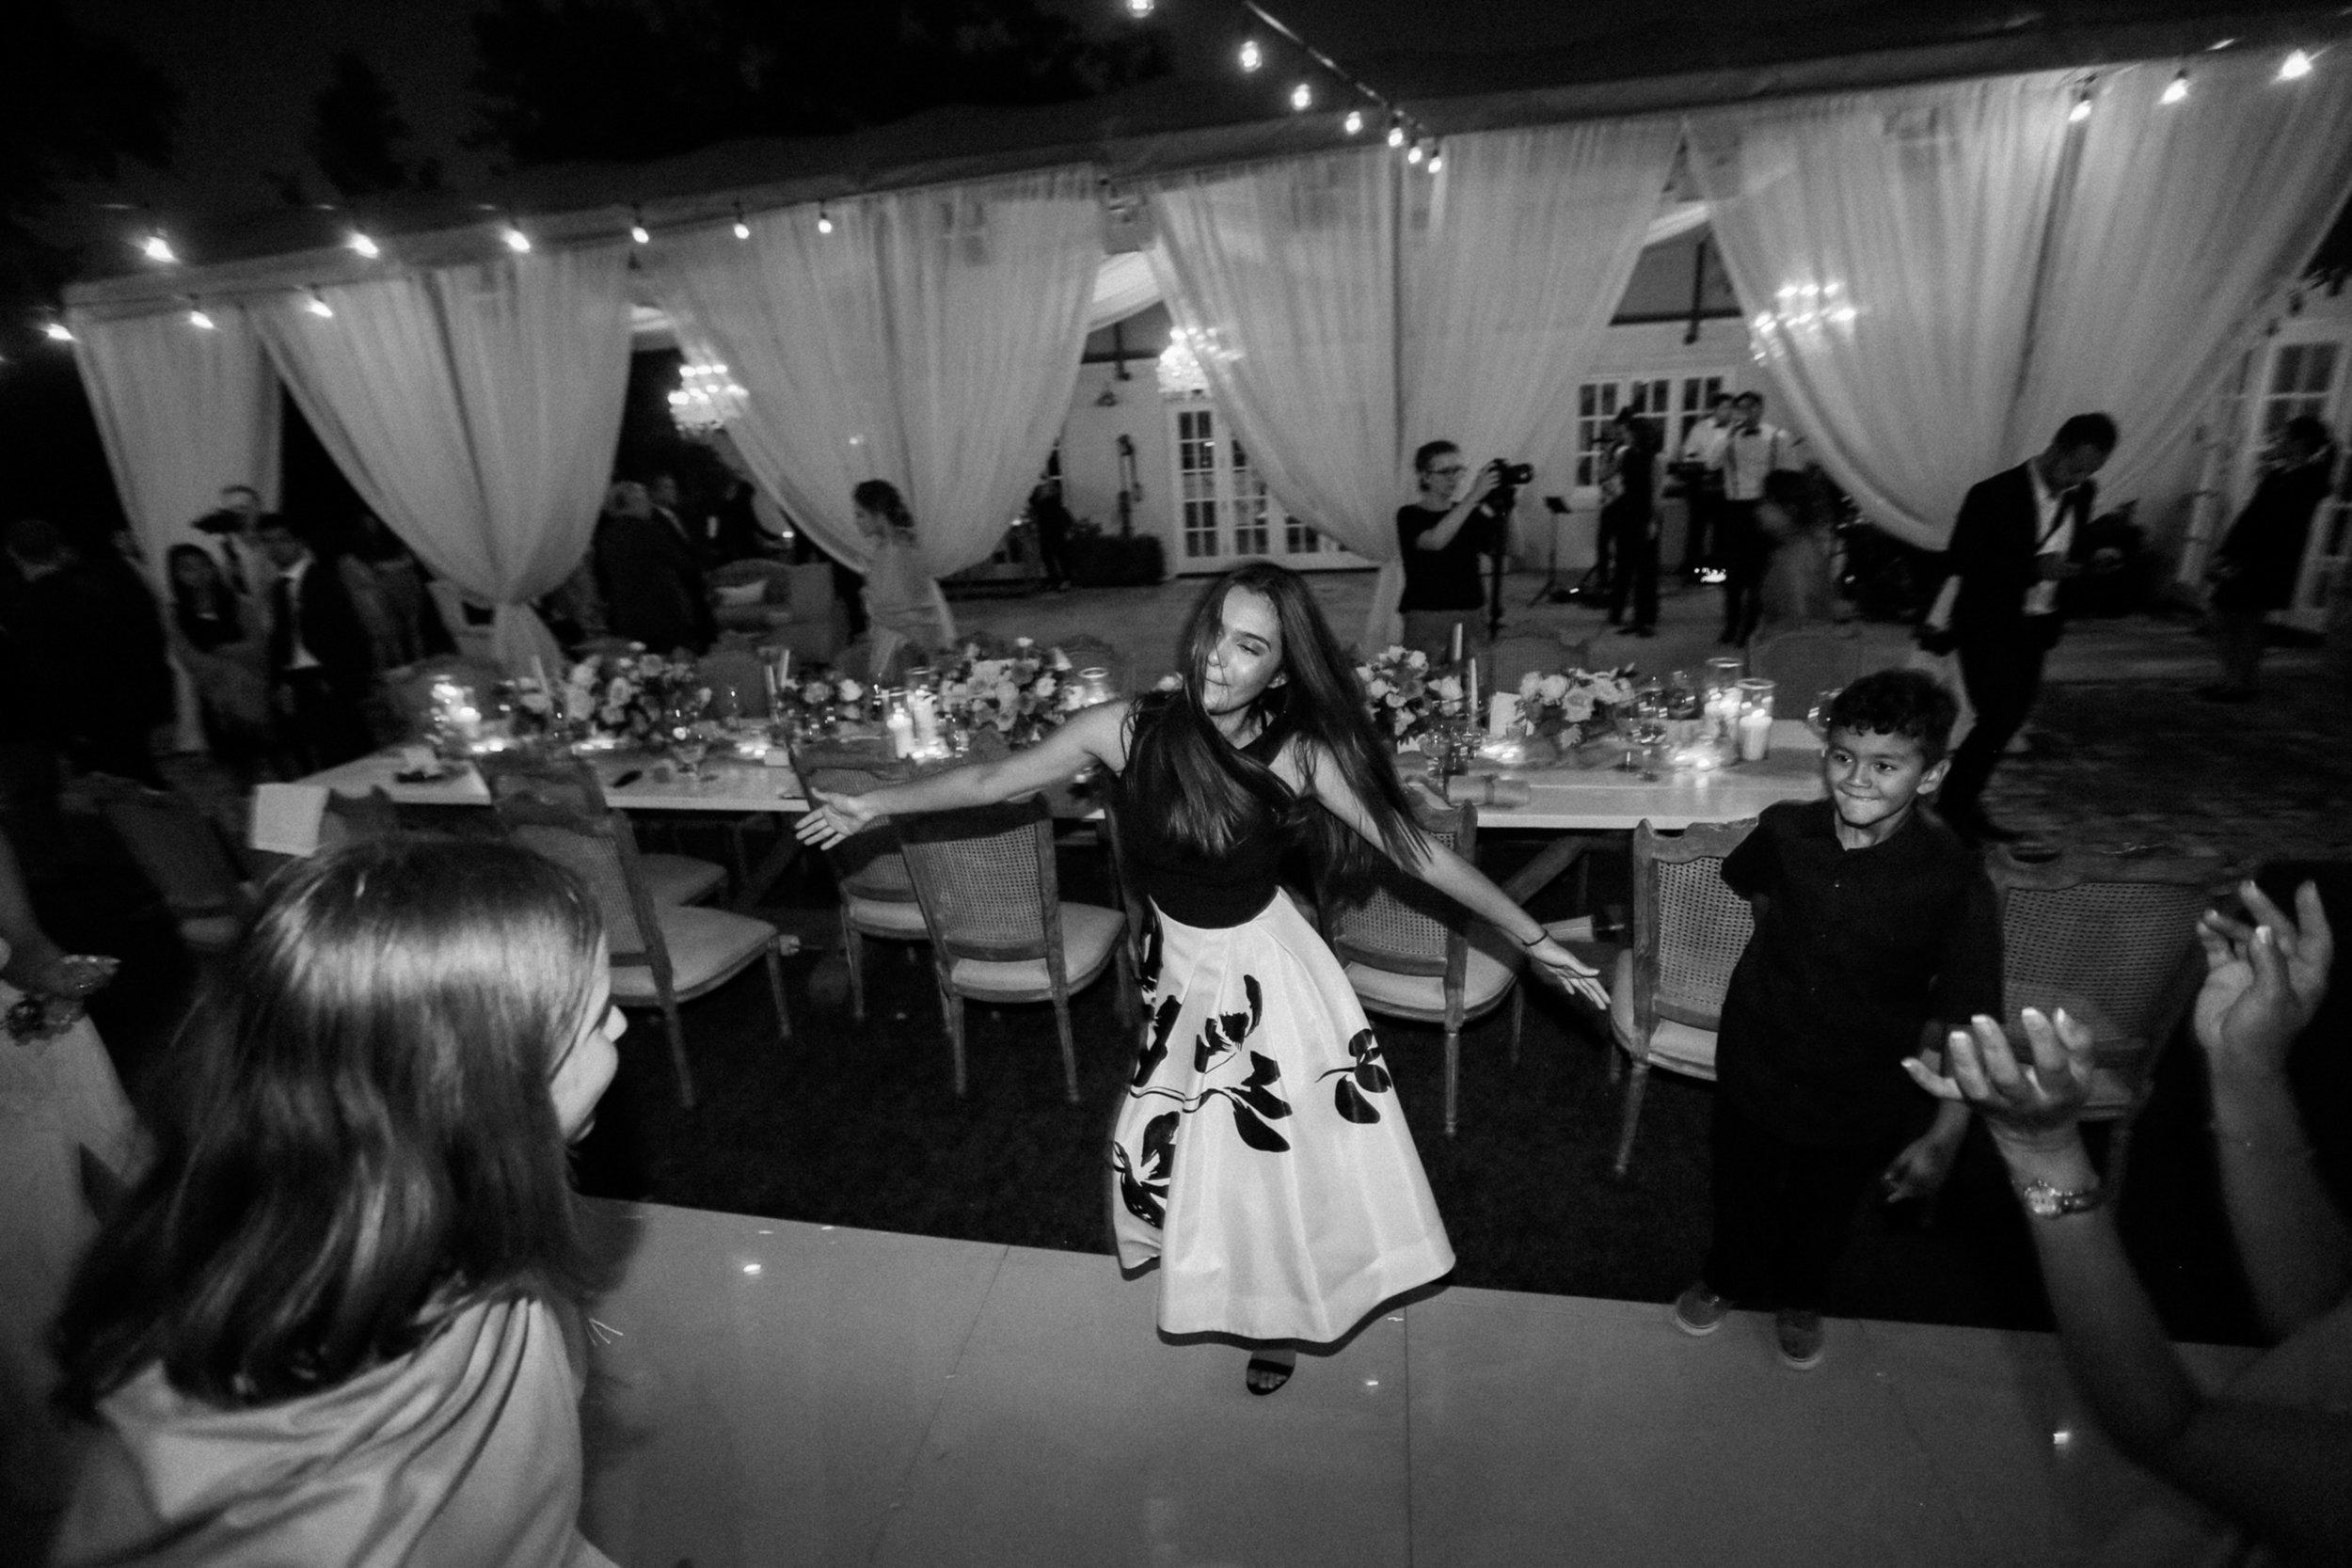 Triunfo_Creek_Winery_Wedding-293-Jen-Huang-JL_Jen_Huang_KB_(283).jpg